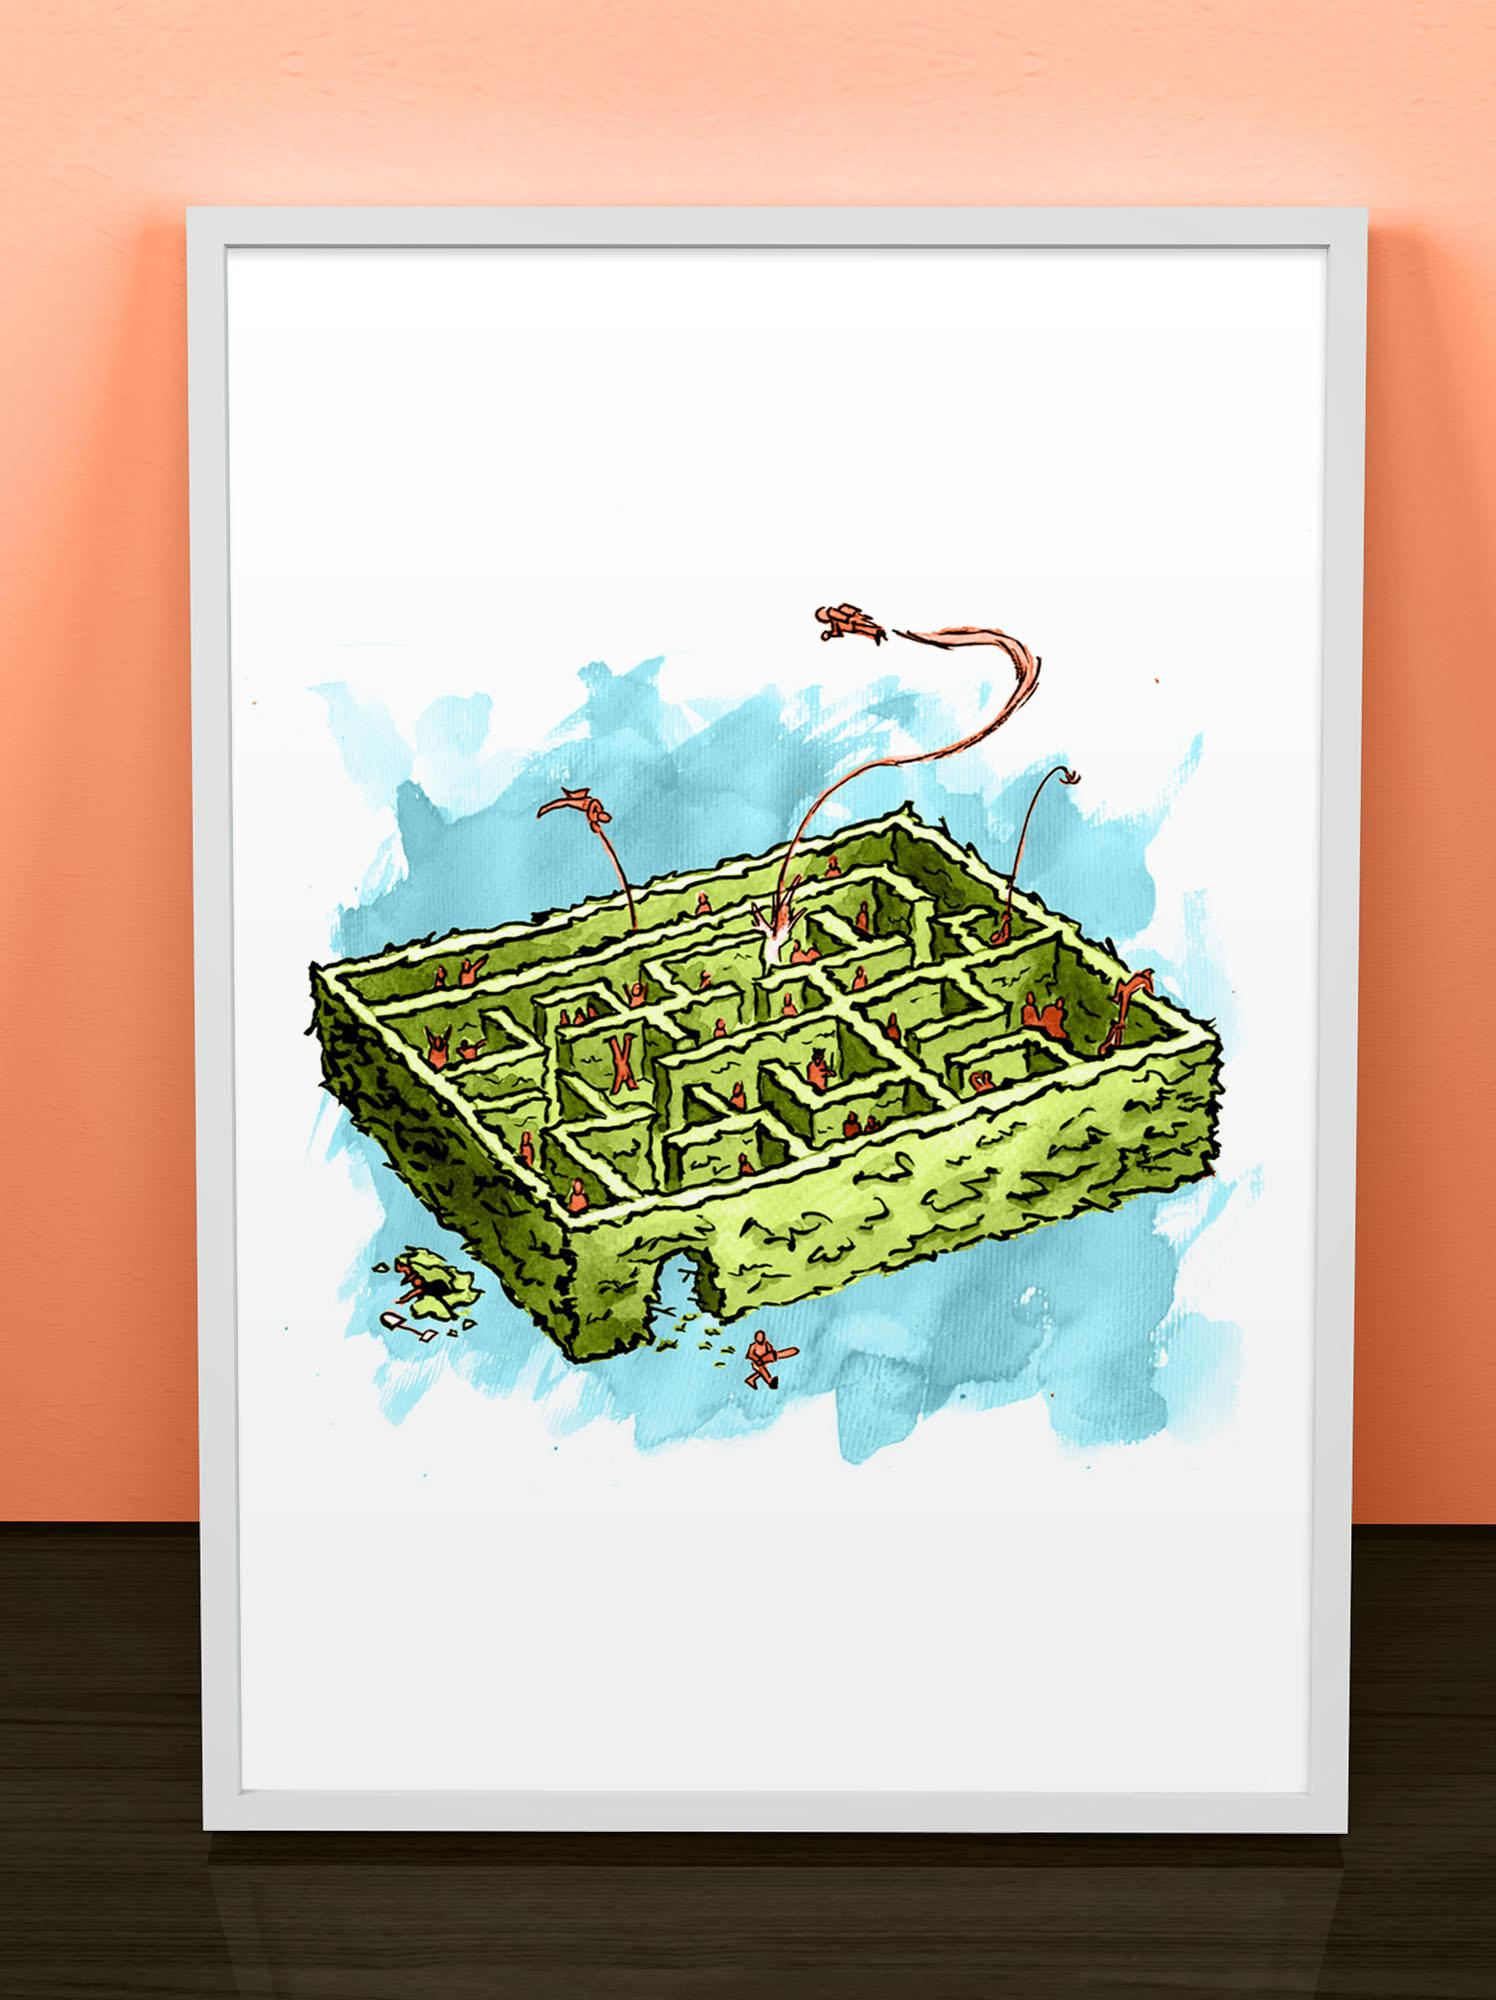 Shop_Maze